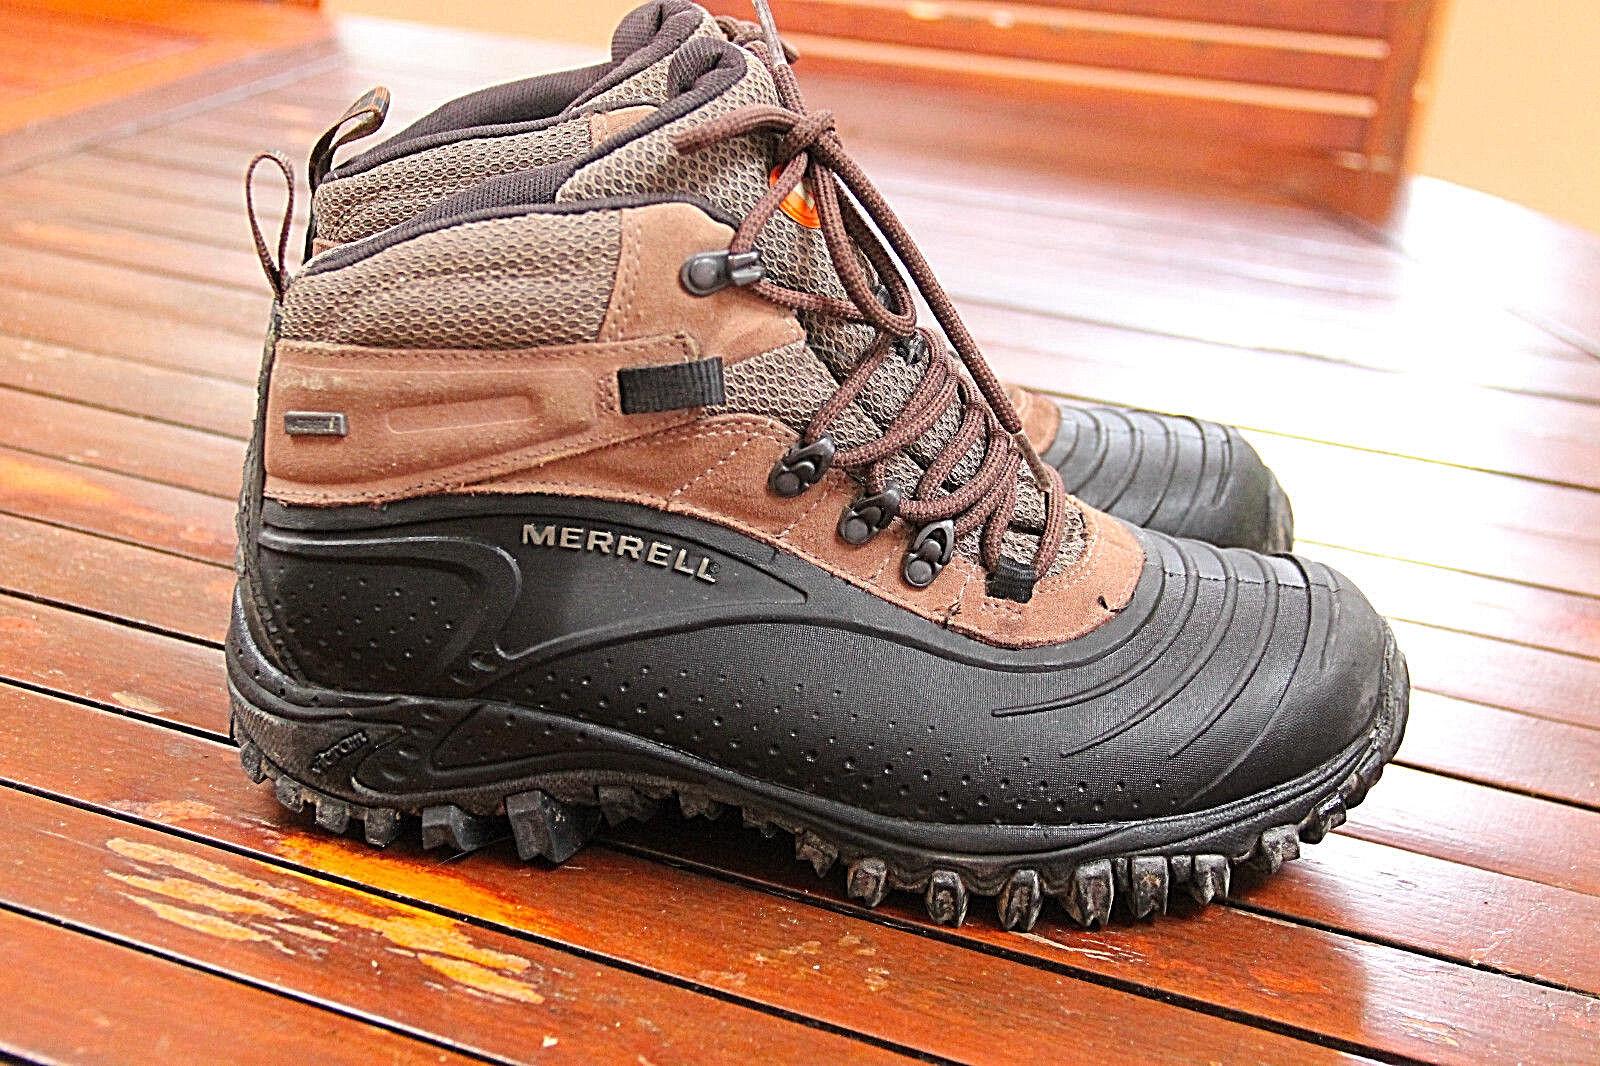 Magníficos Zapatos Senderismo Trek Resistente Al  Agua Merell P 42 Eu Uk8 Valor  tiendas minoristas